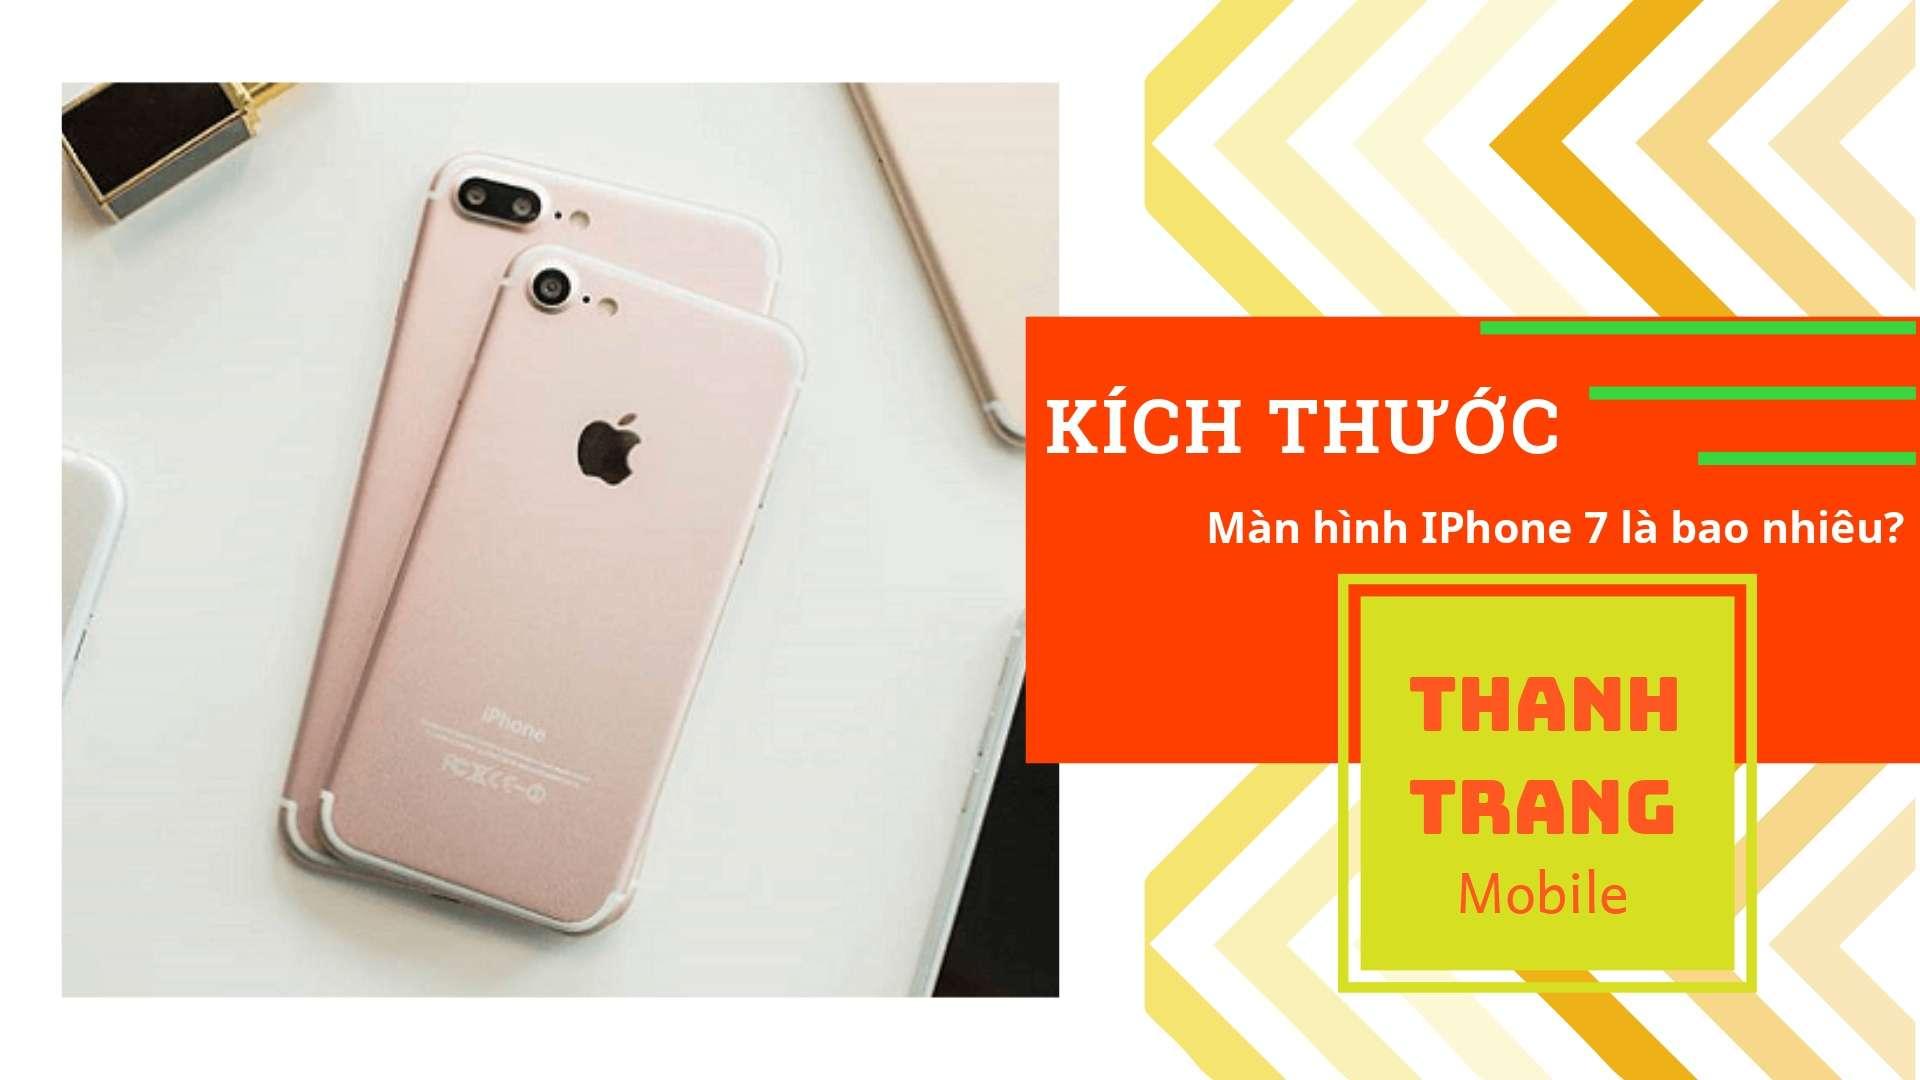 kich thuoc man hinh iphone